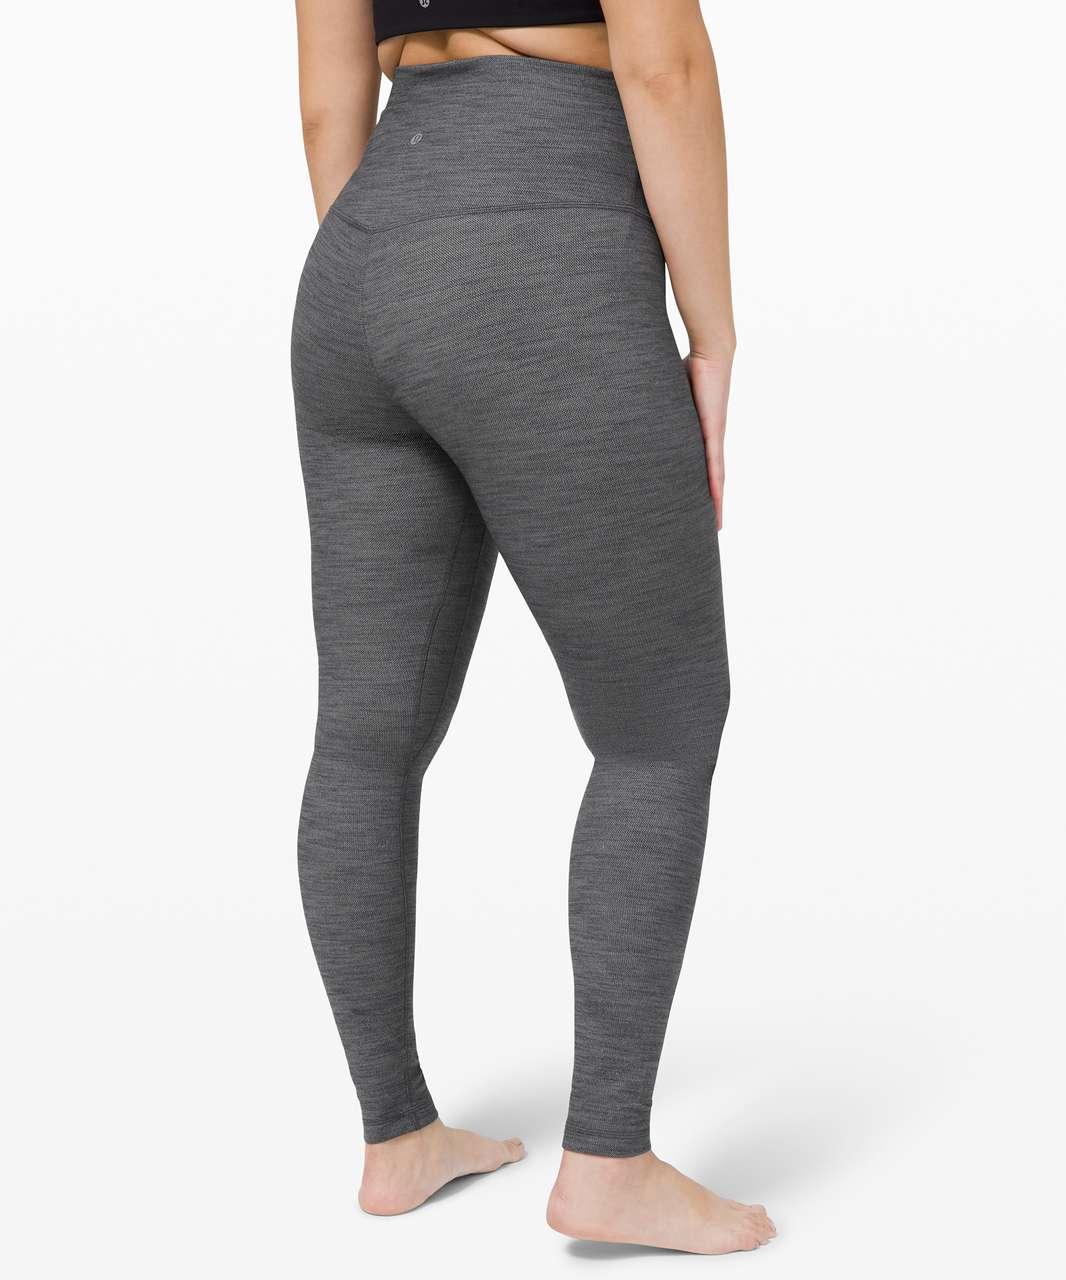 "Lululemon Align Pant Super High-Rise 28"" - Mini Heathered Herringbone Heathered Black White / Black"